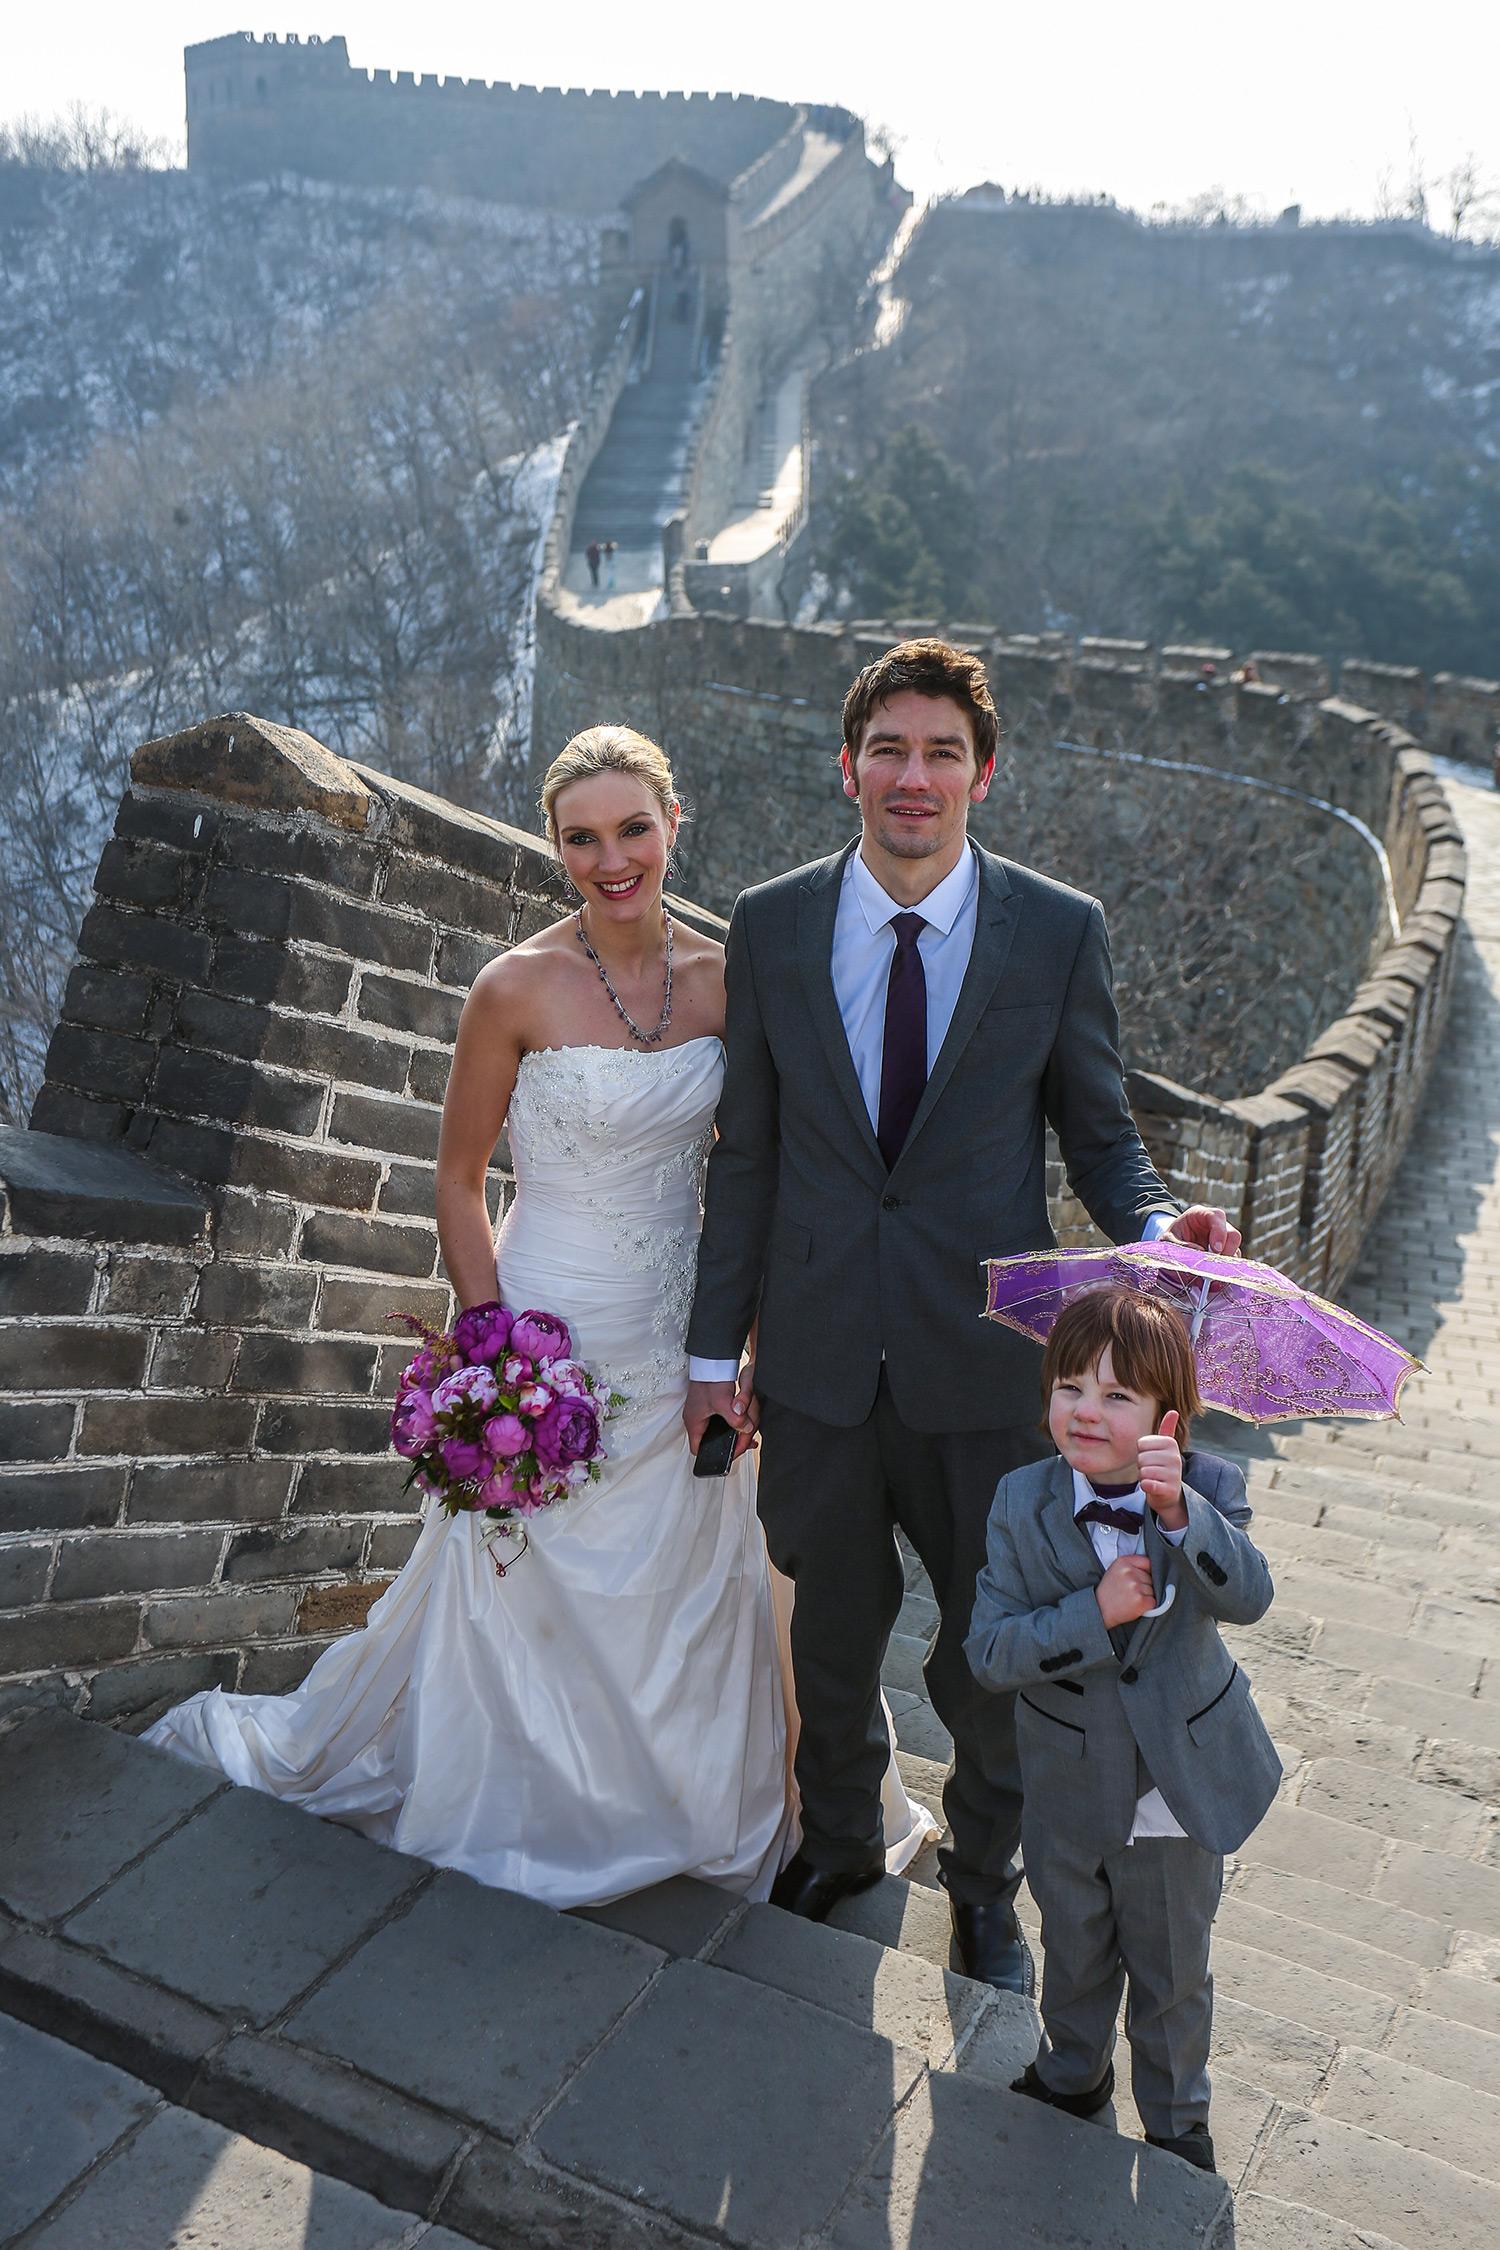 Amelia and Brett's Great Wall of China wedding